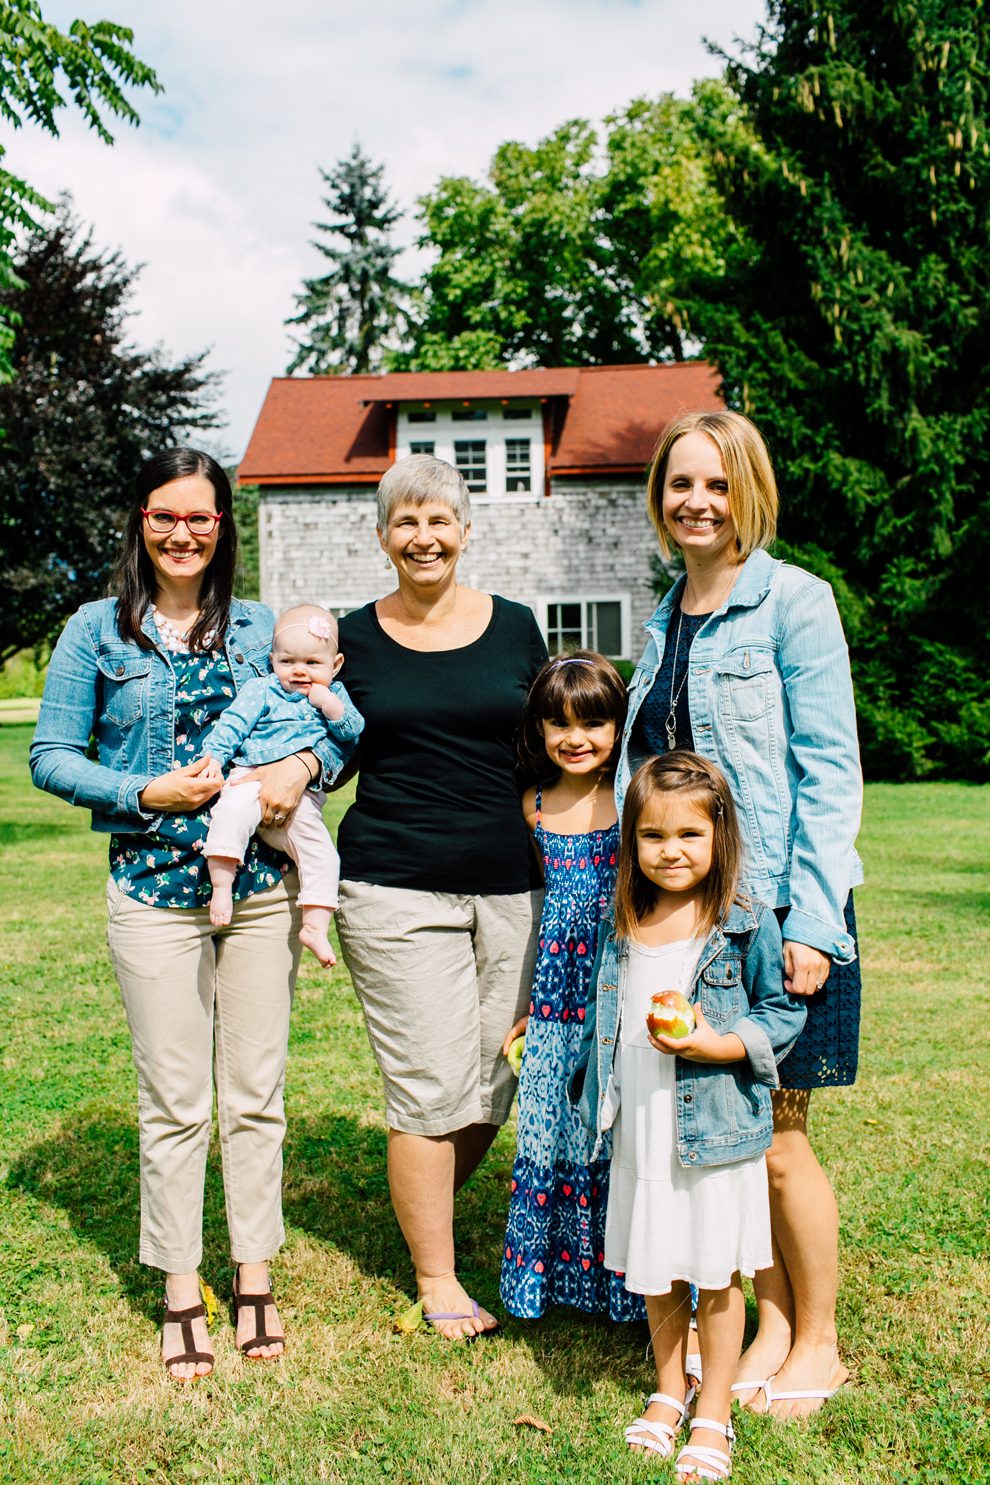 026-deming-bellingham-family-photographer-lifestyle-katheryn-moran.jpg